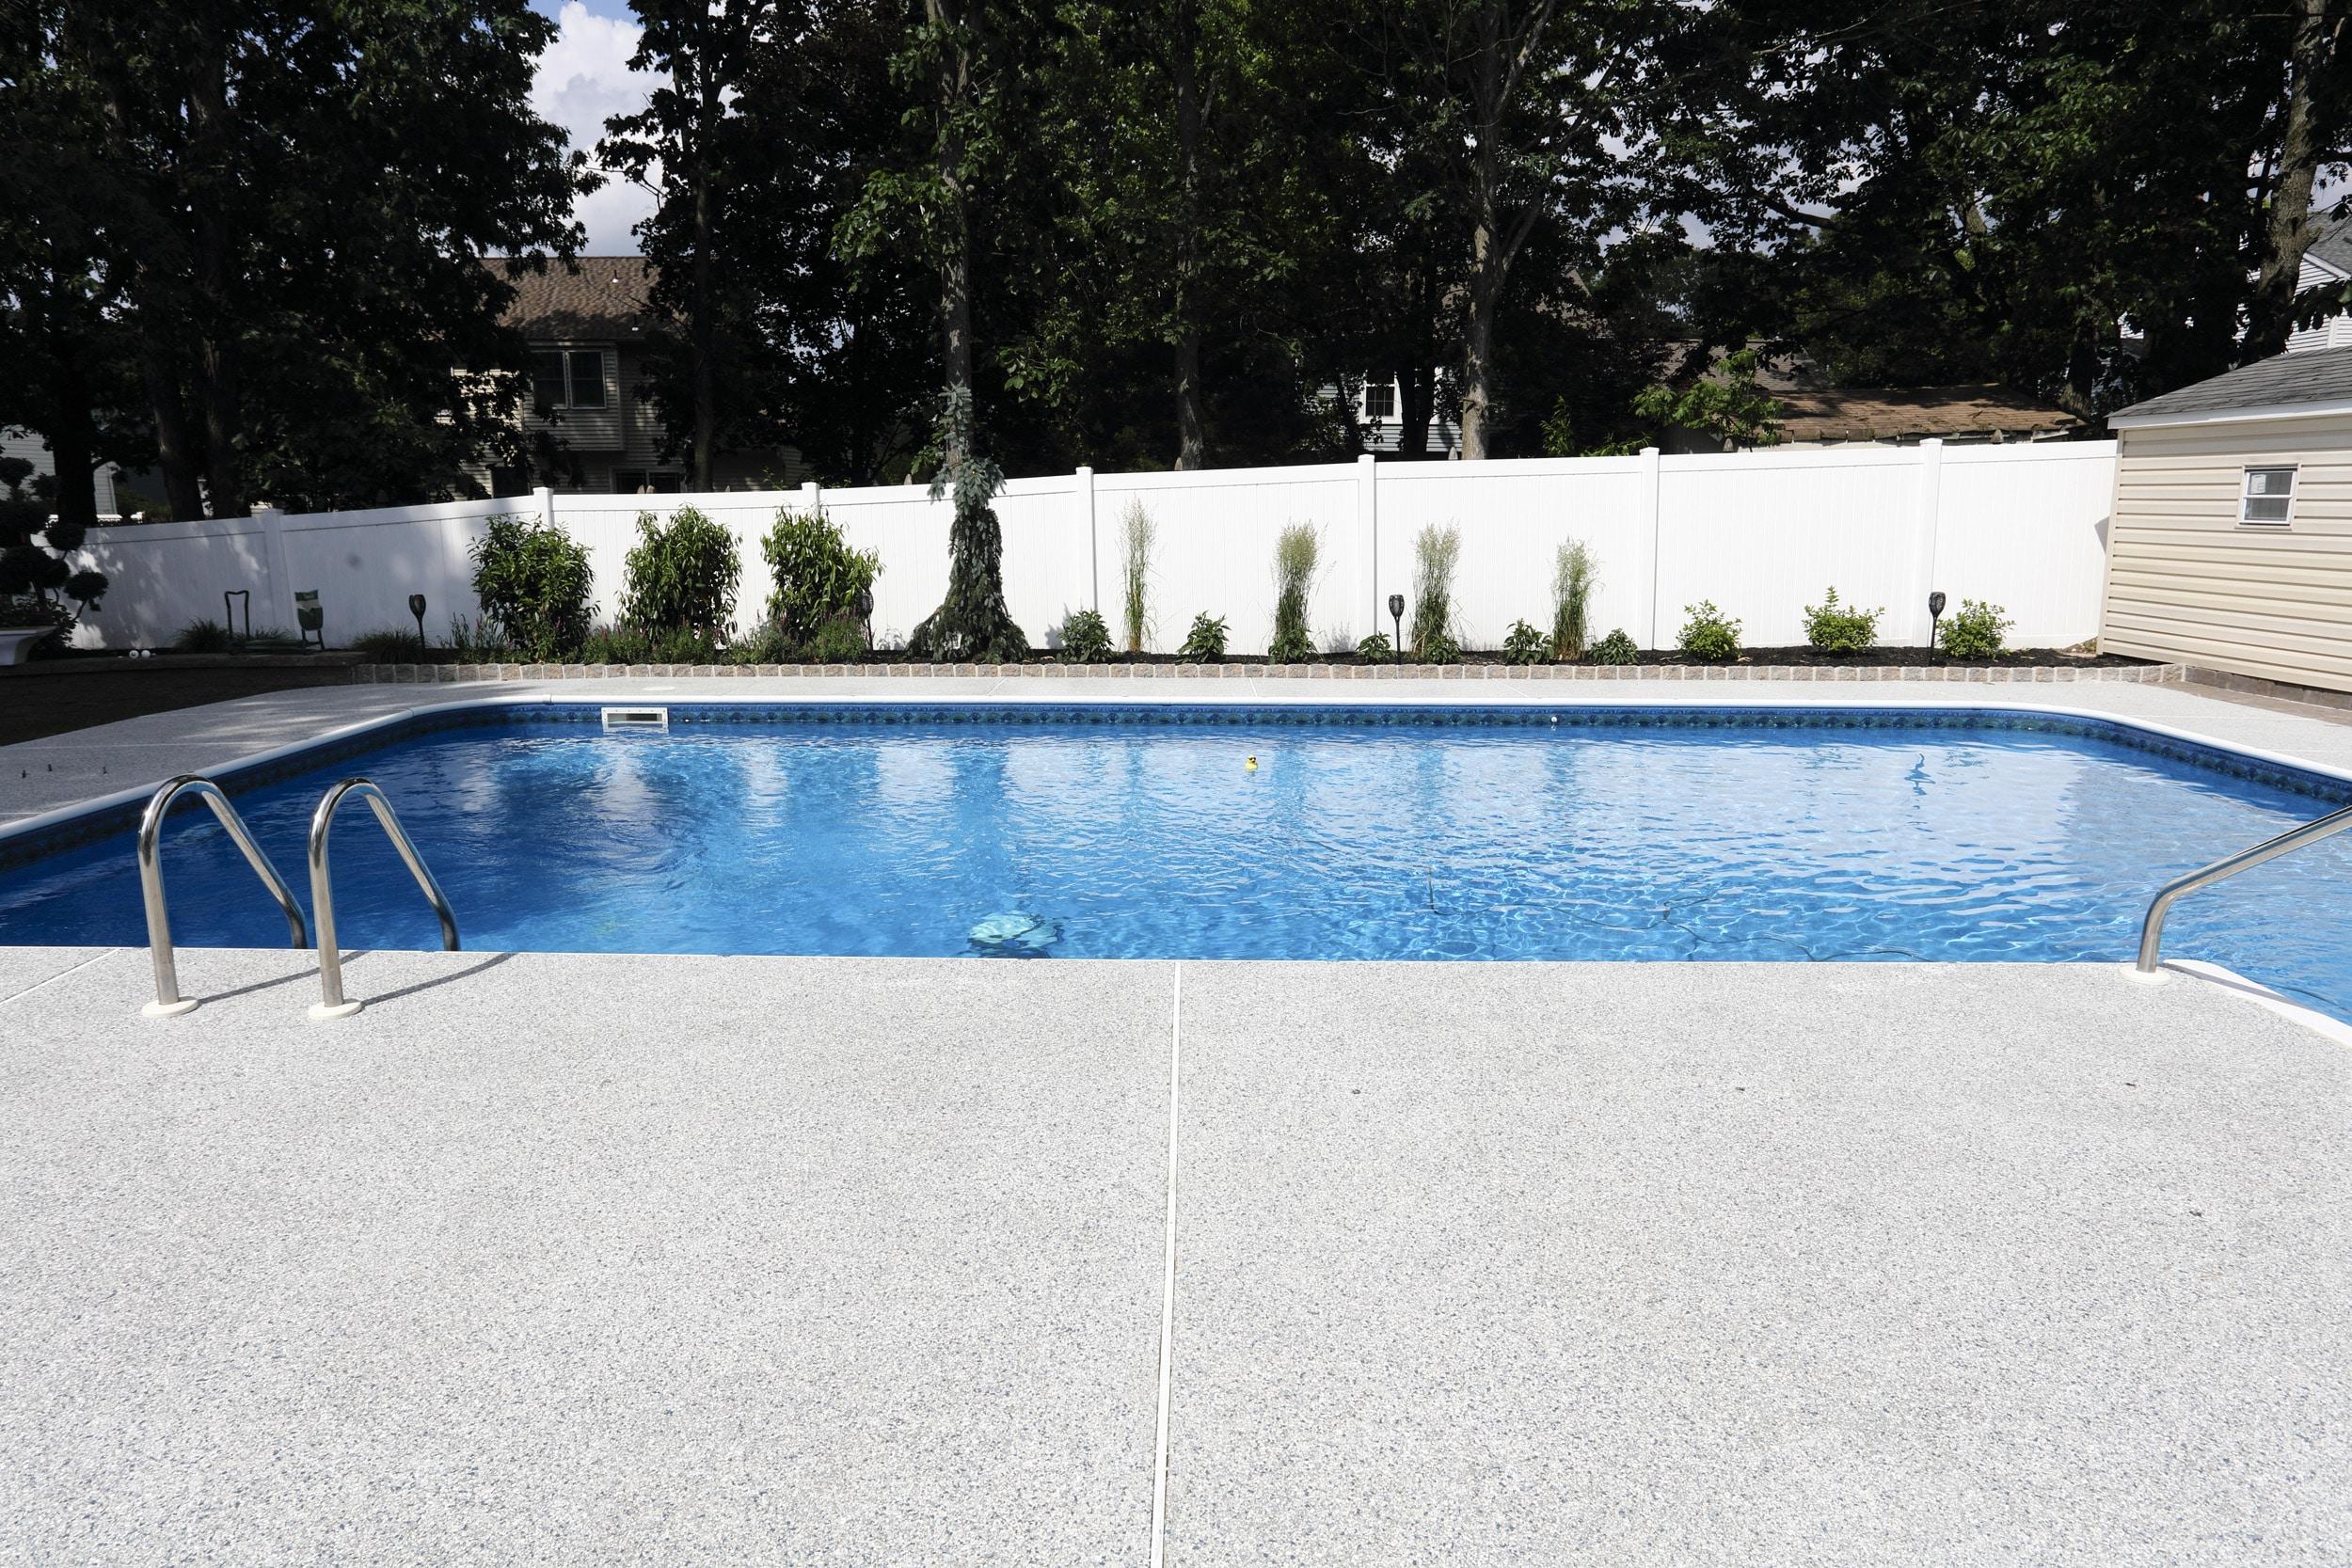 Pool concrete coatings nj